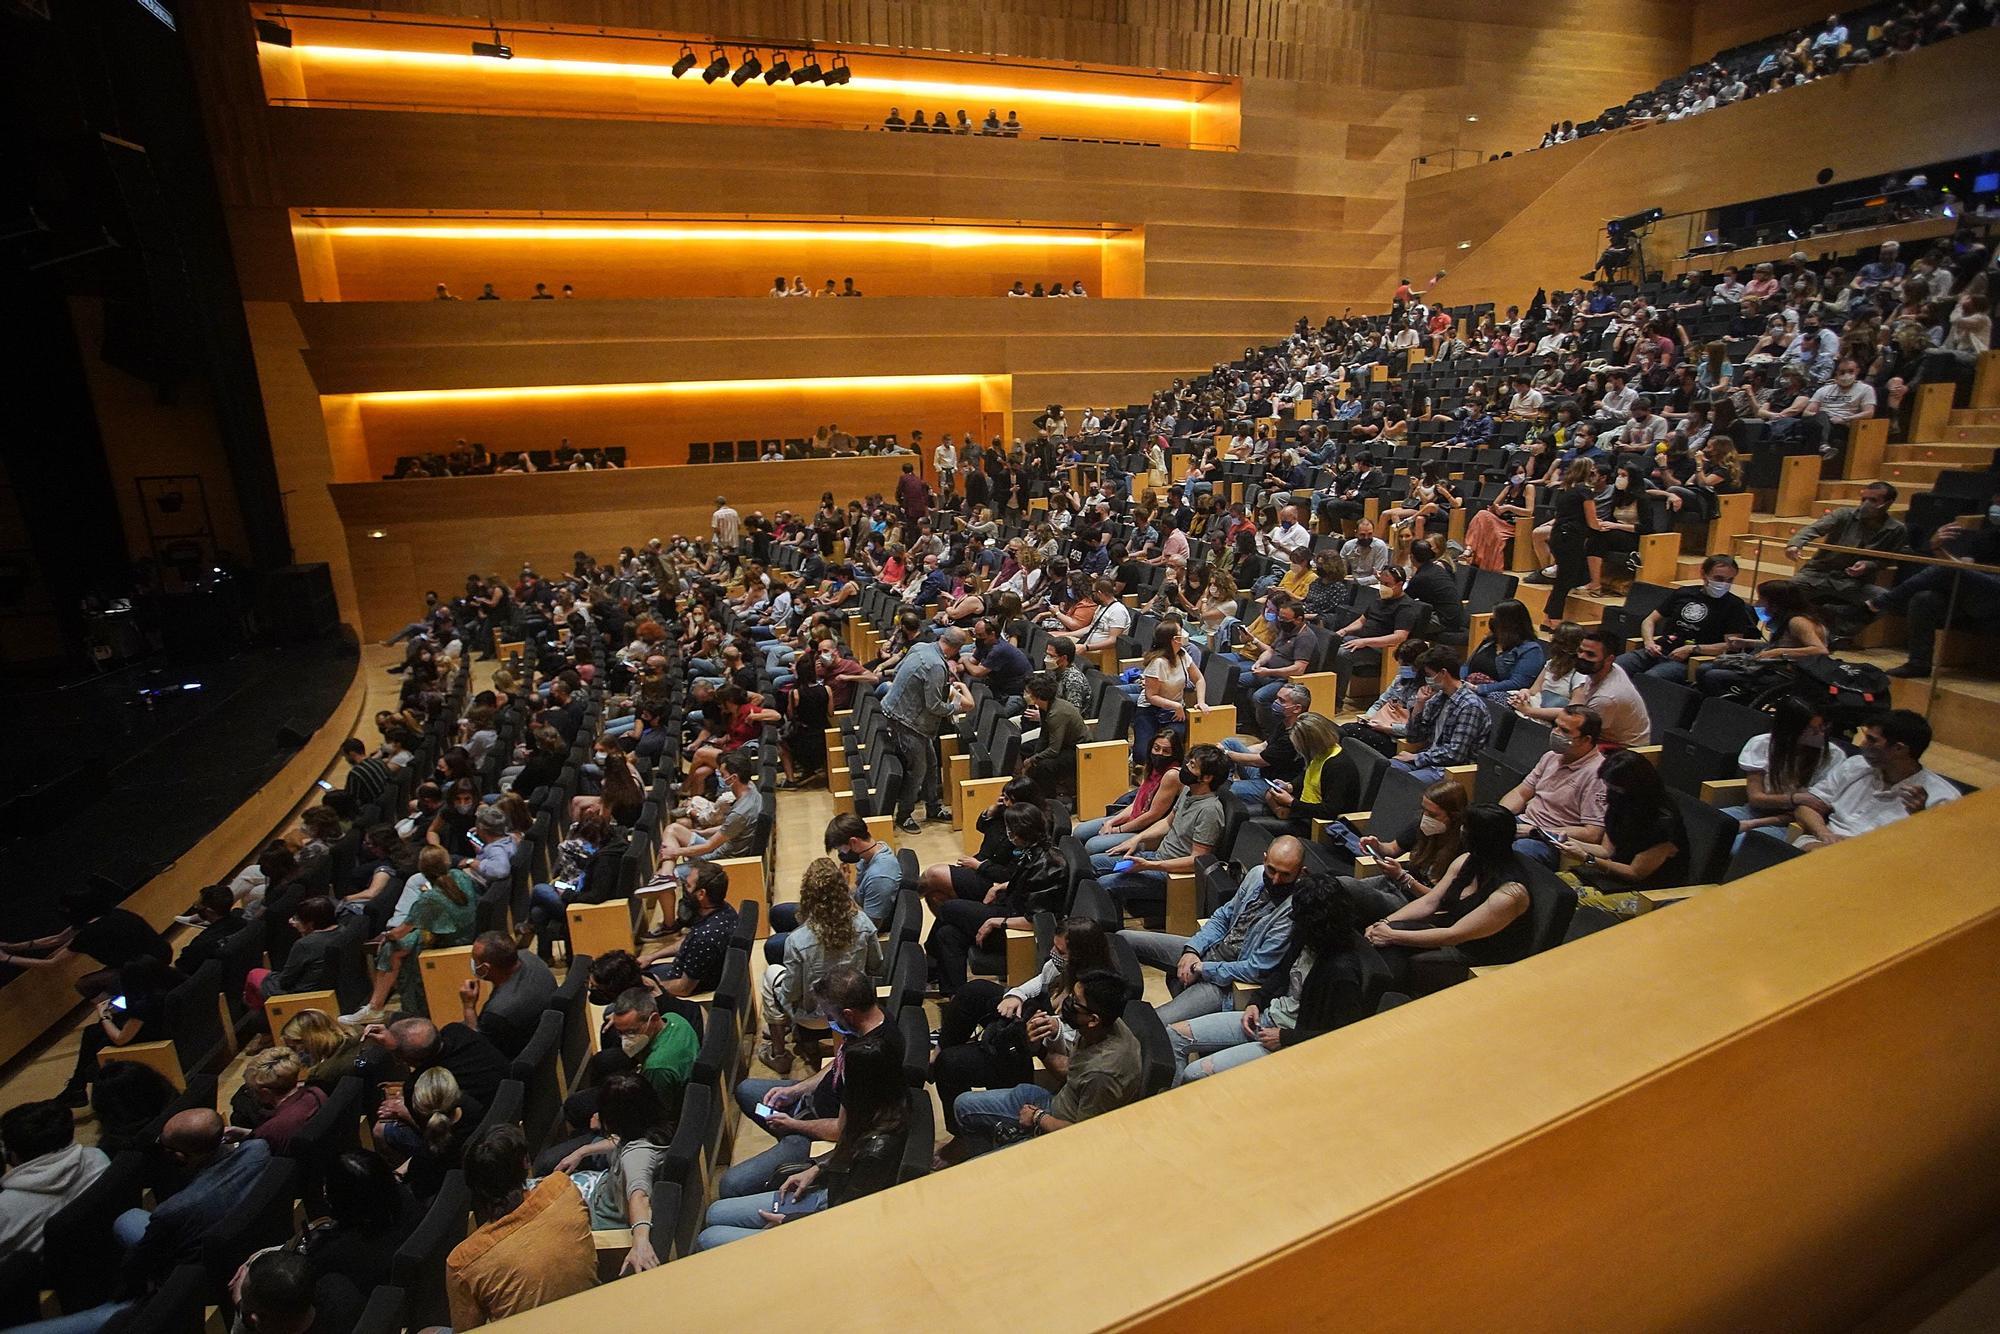 Concert de Love of Lesbian a l'Auditori de Girona